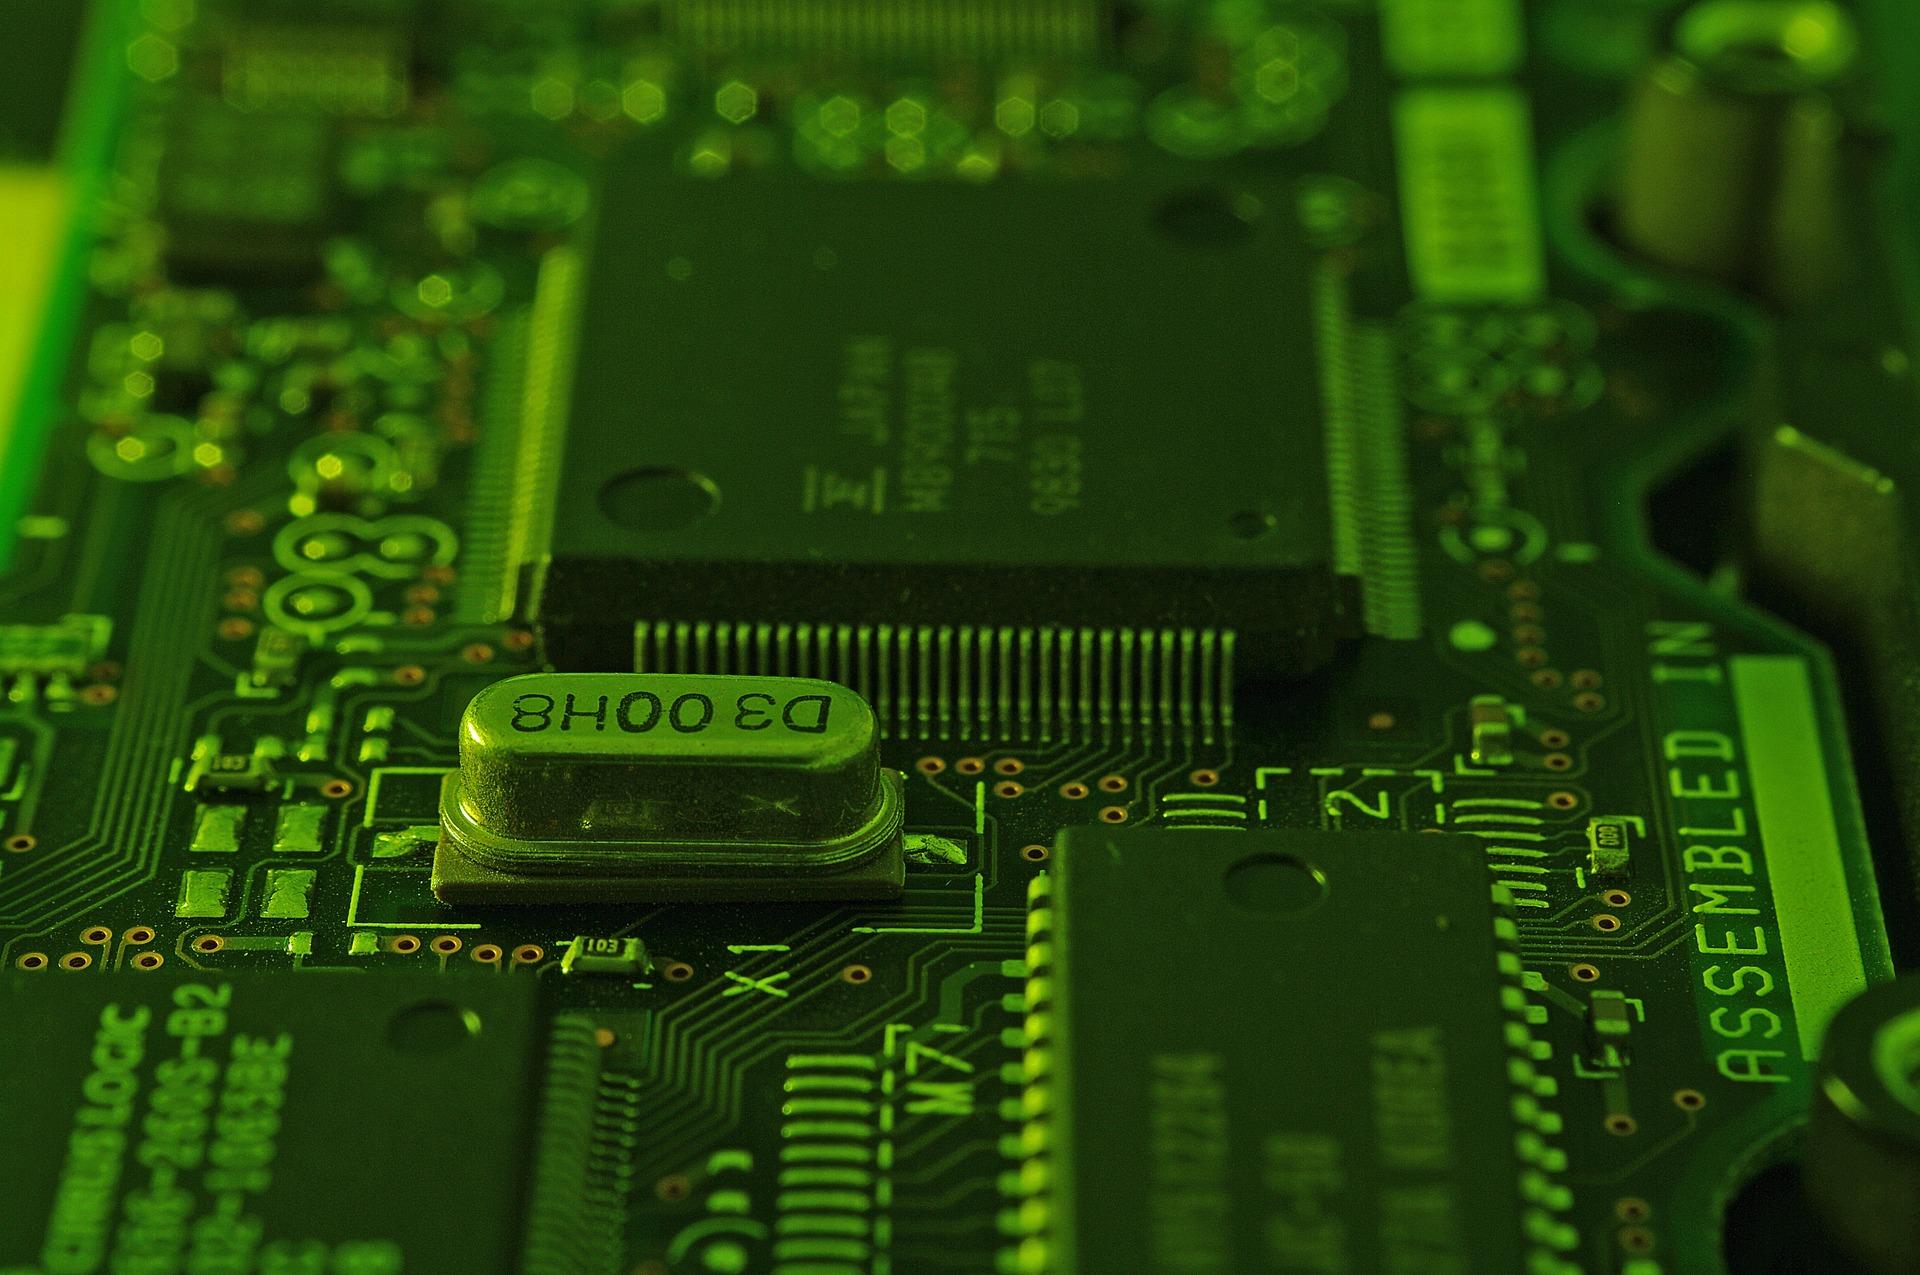 Green Circuitry